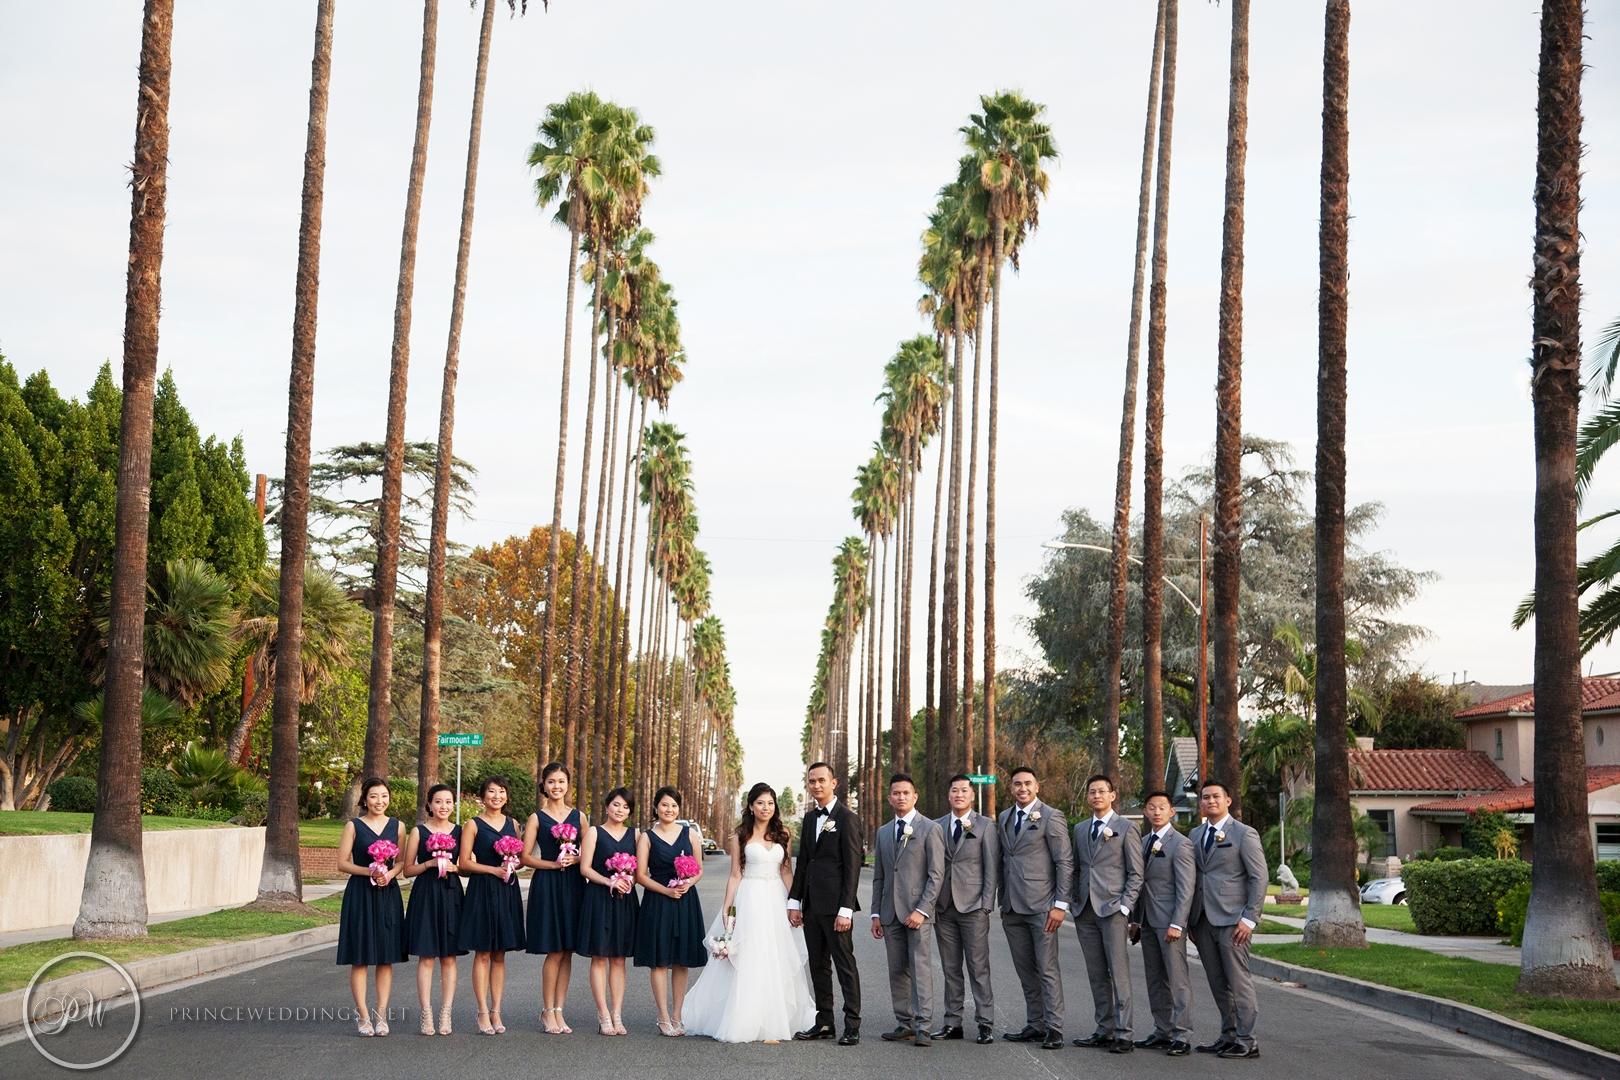 Castaway_Burbank_Wedding_Photo_Christian_Autumn049.jpg